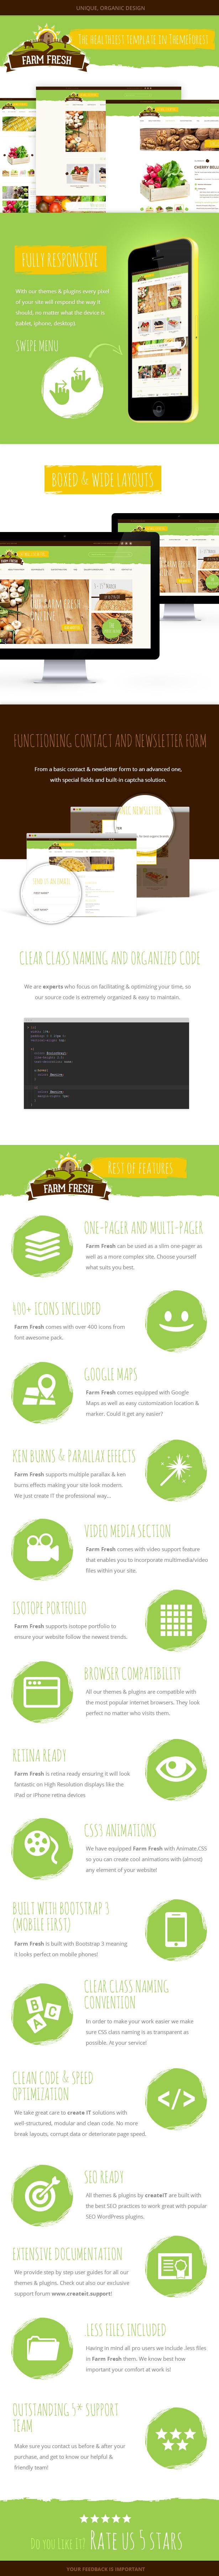 Farm Fresh Features List